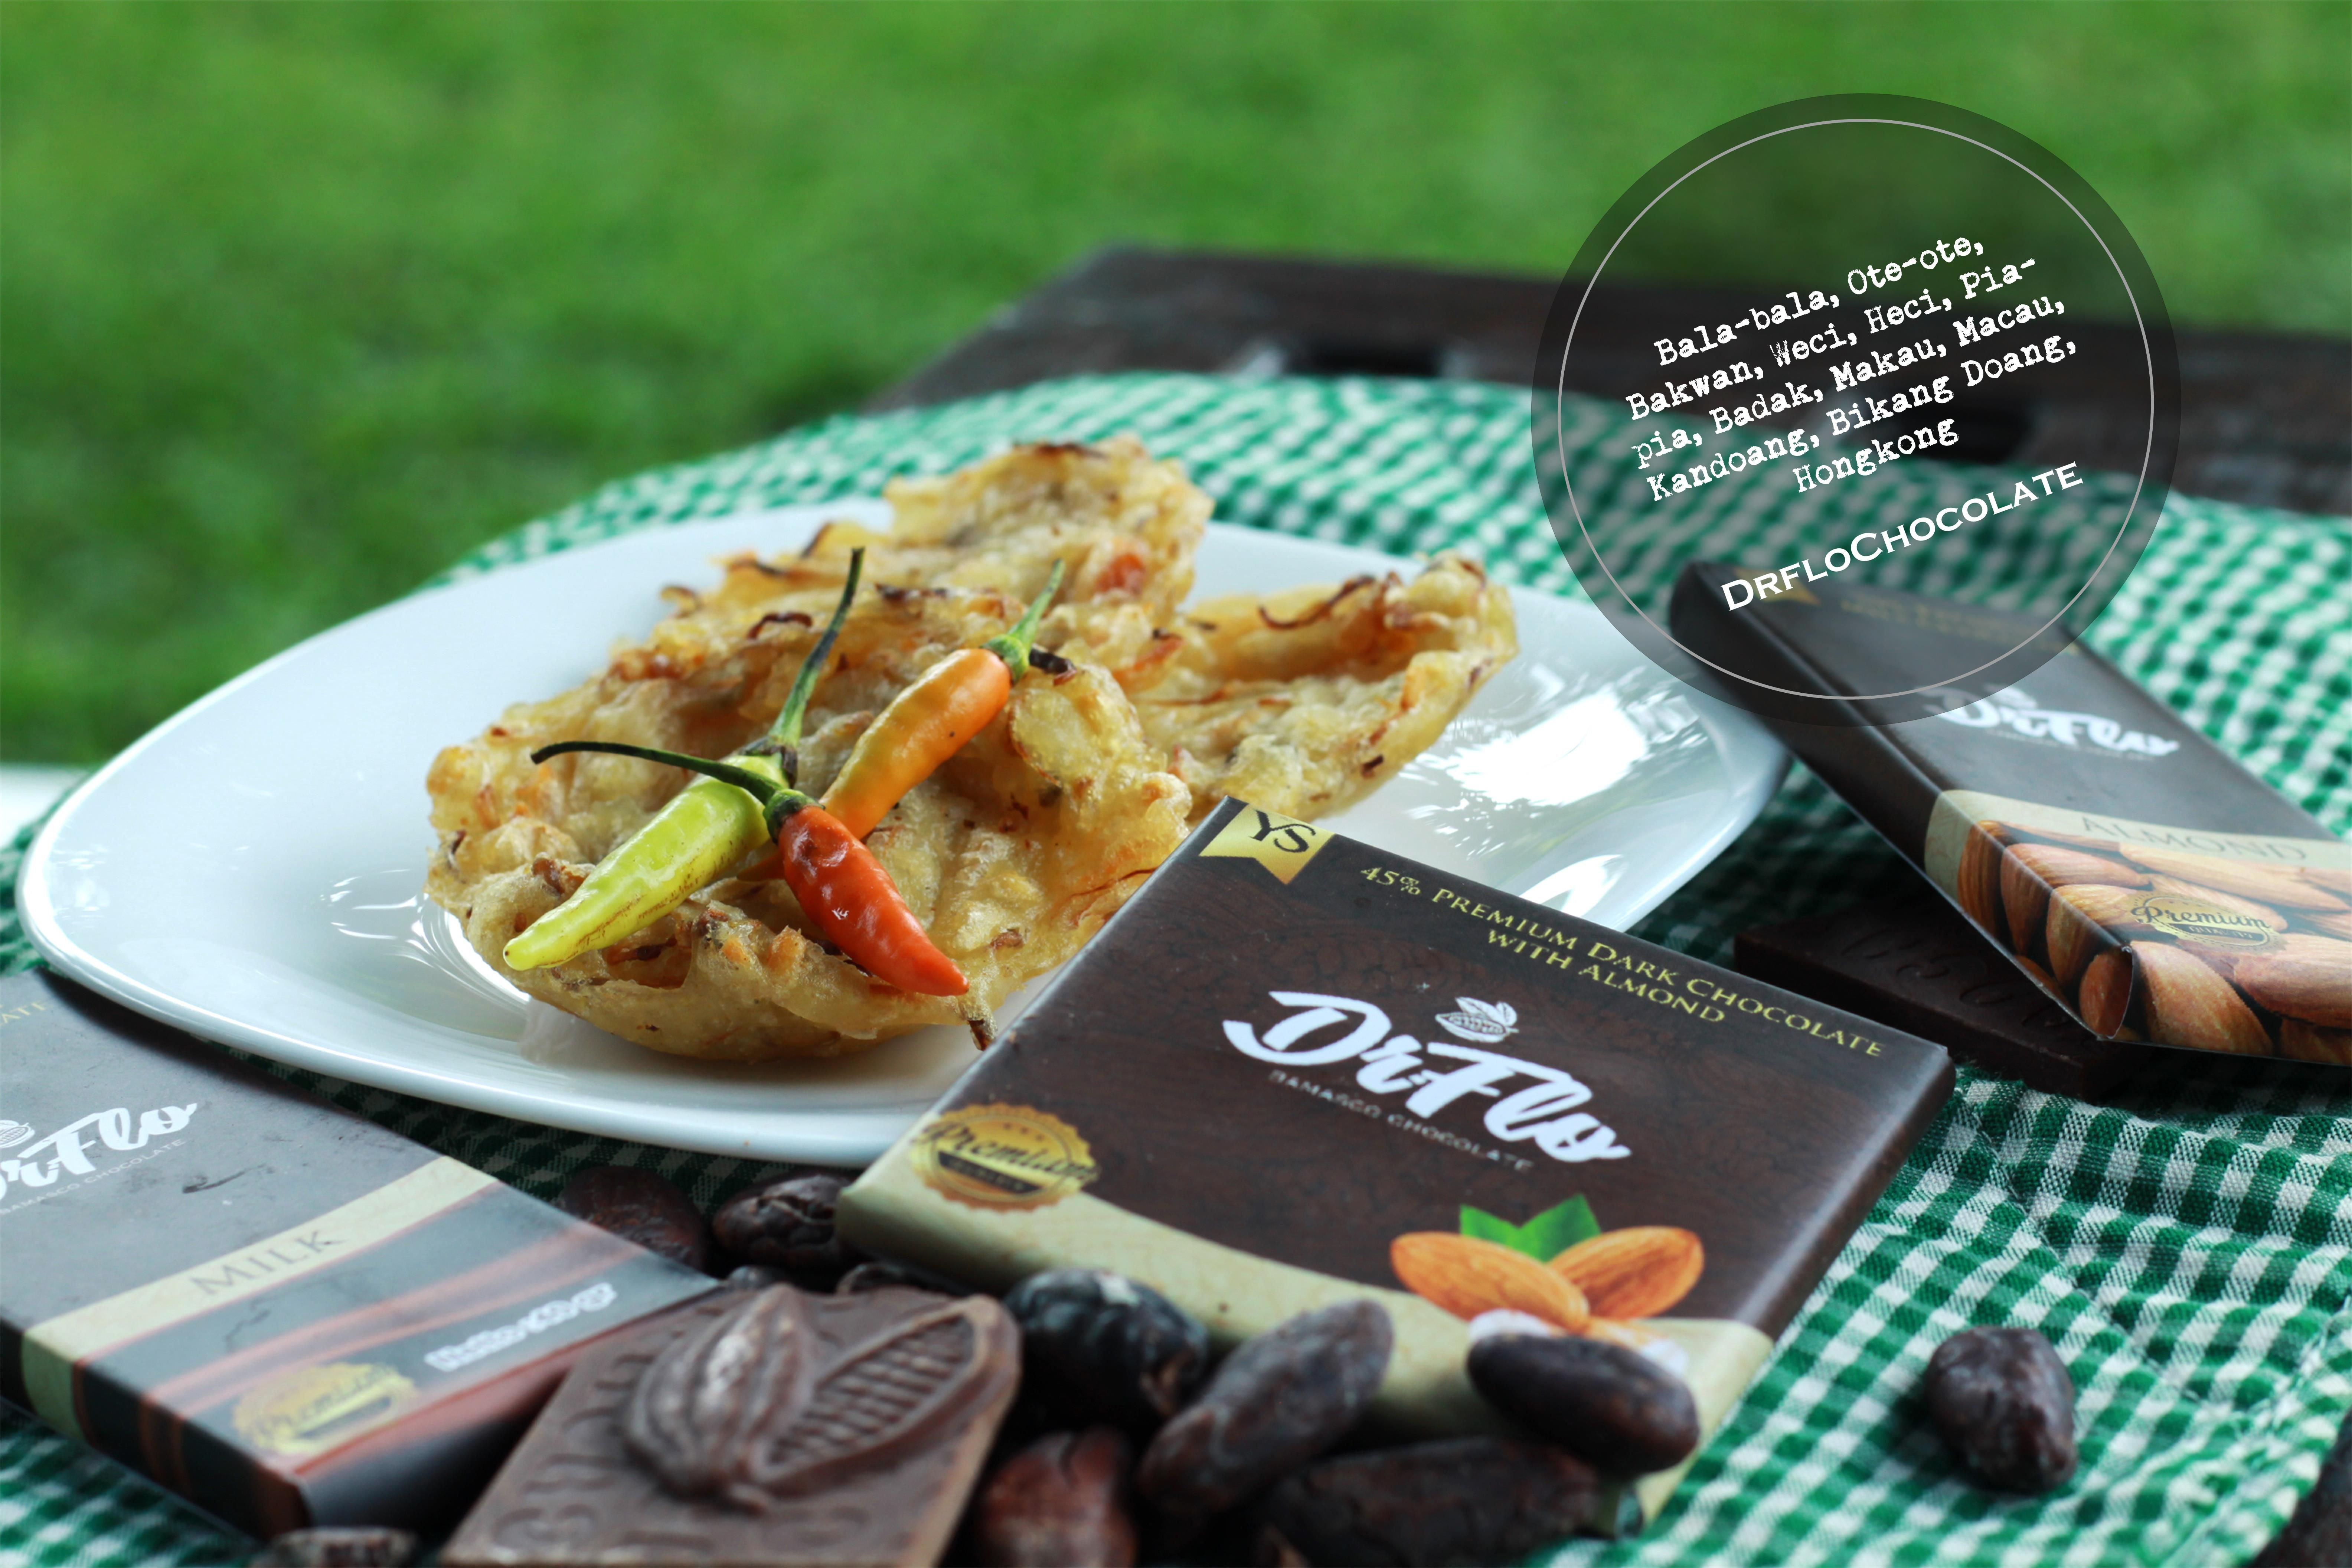 Bala Bala Ote Ote Bakwan Weci Heci Pia Pia Badak Makau Macau Kandoang Bikang Doang Hongkong Kekayaan Budaya Indonesia Den Makanan Cokelat Indonesia